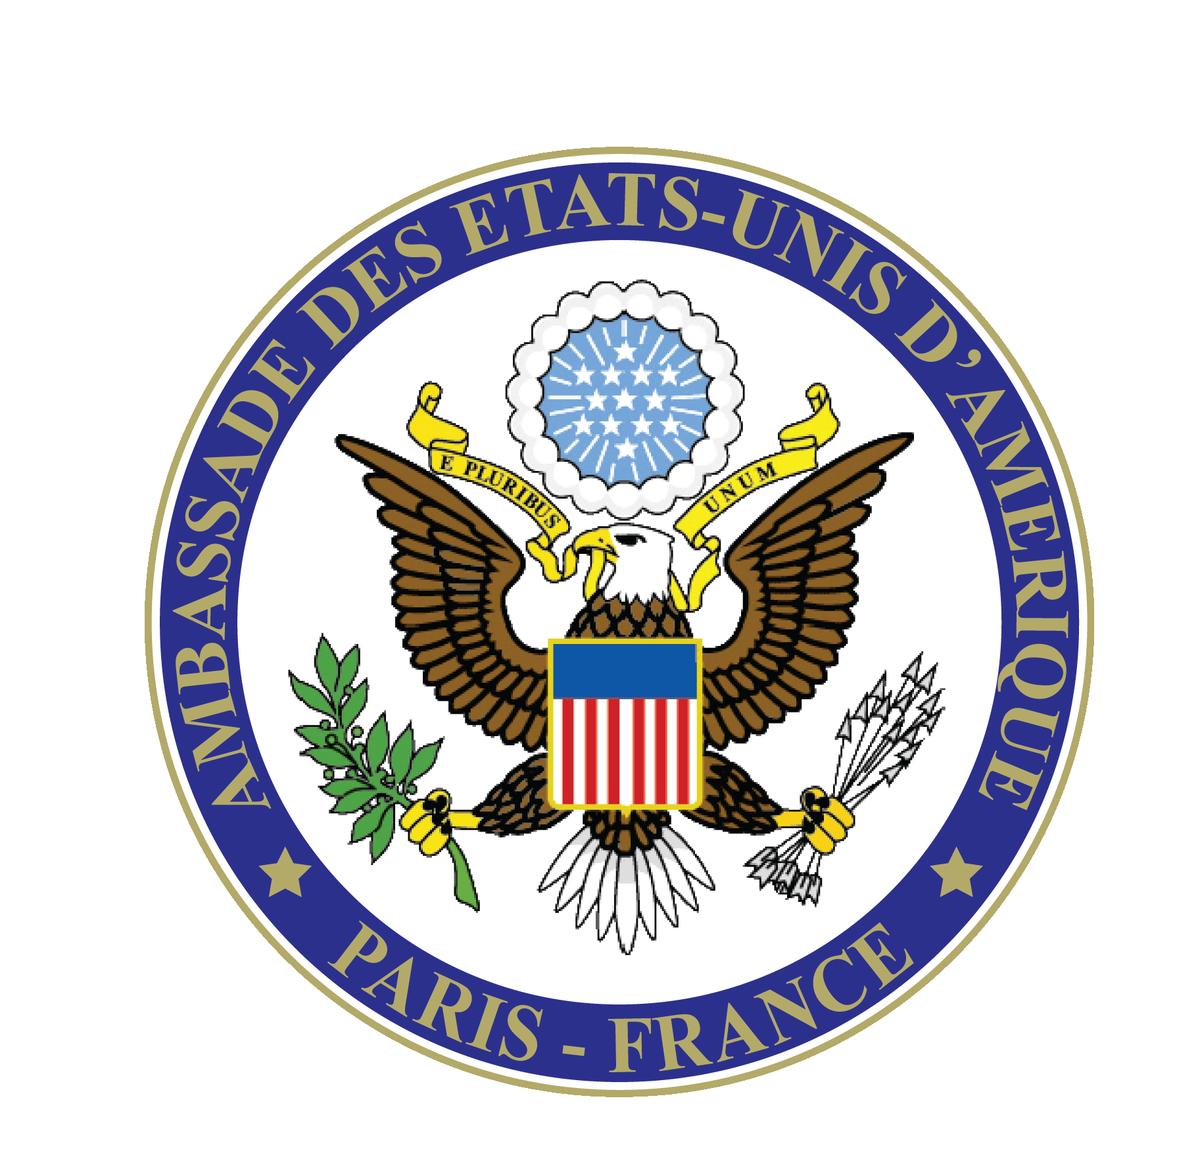 U S Embassy France On Twitter L Ambassade Des Etats Unis D